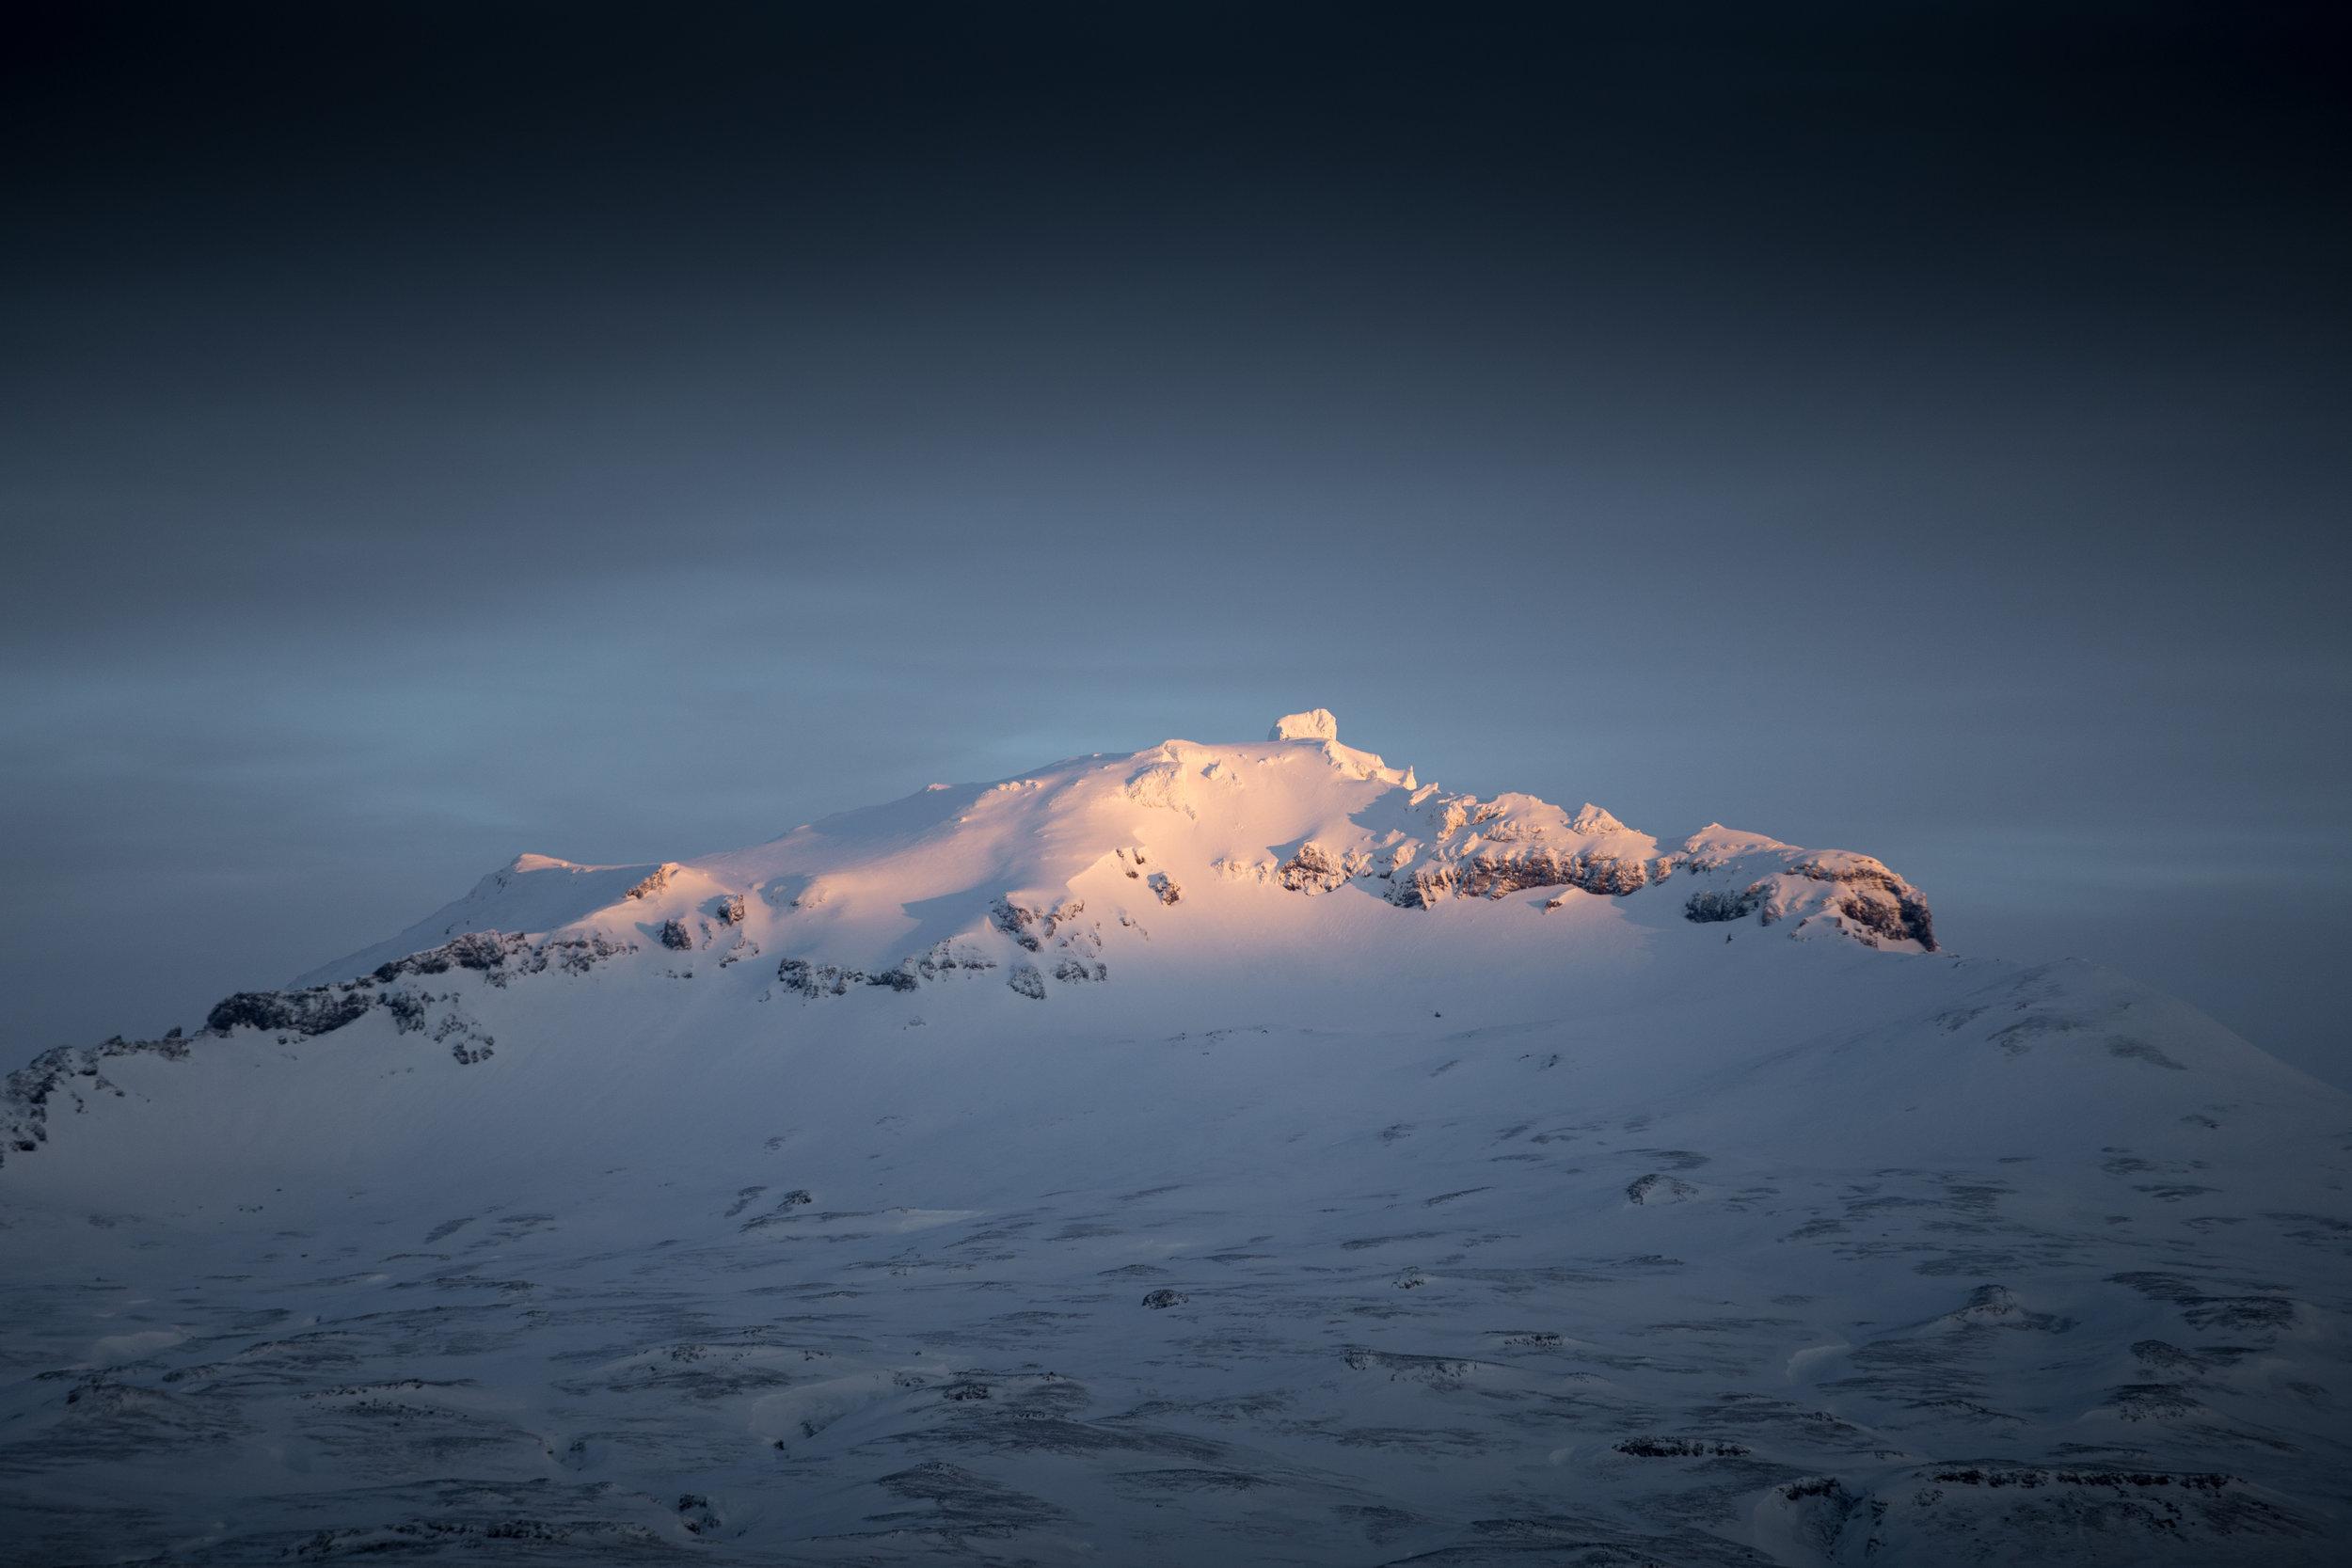 jermiah-schuster-iceland-198.jpg